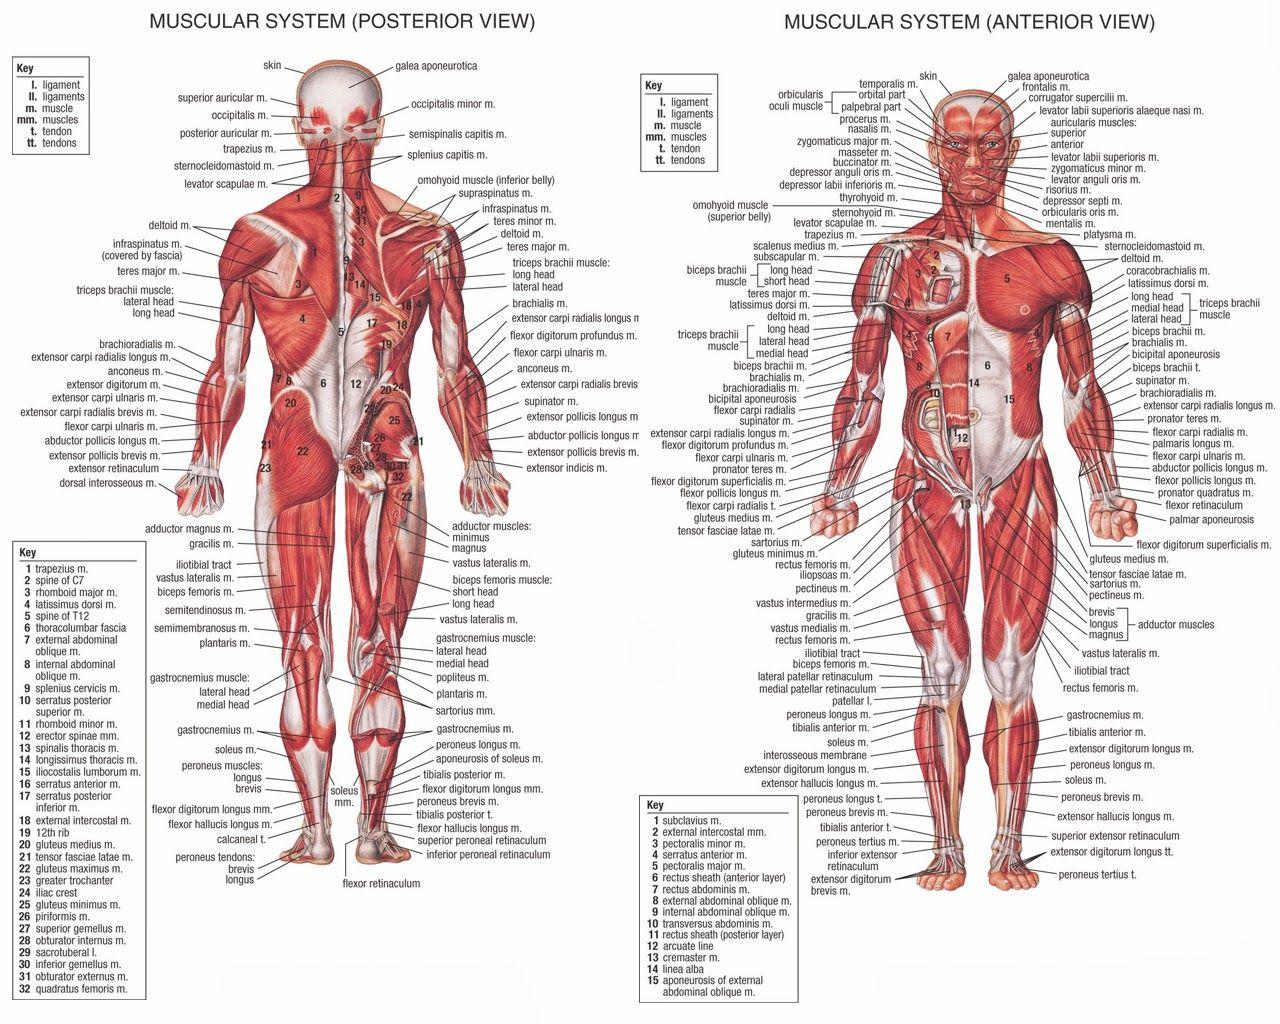 Pin by ezgi bakkaloğlu on anatomy   Pinterest   Anatomy